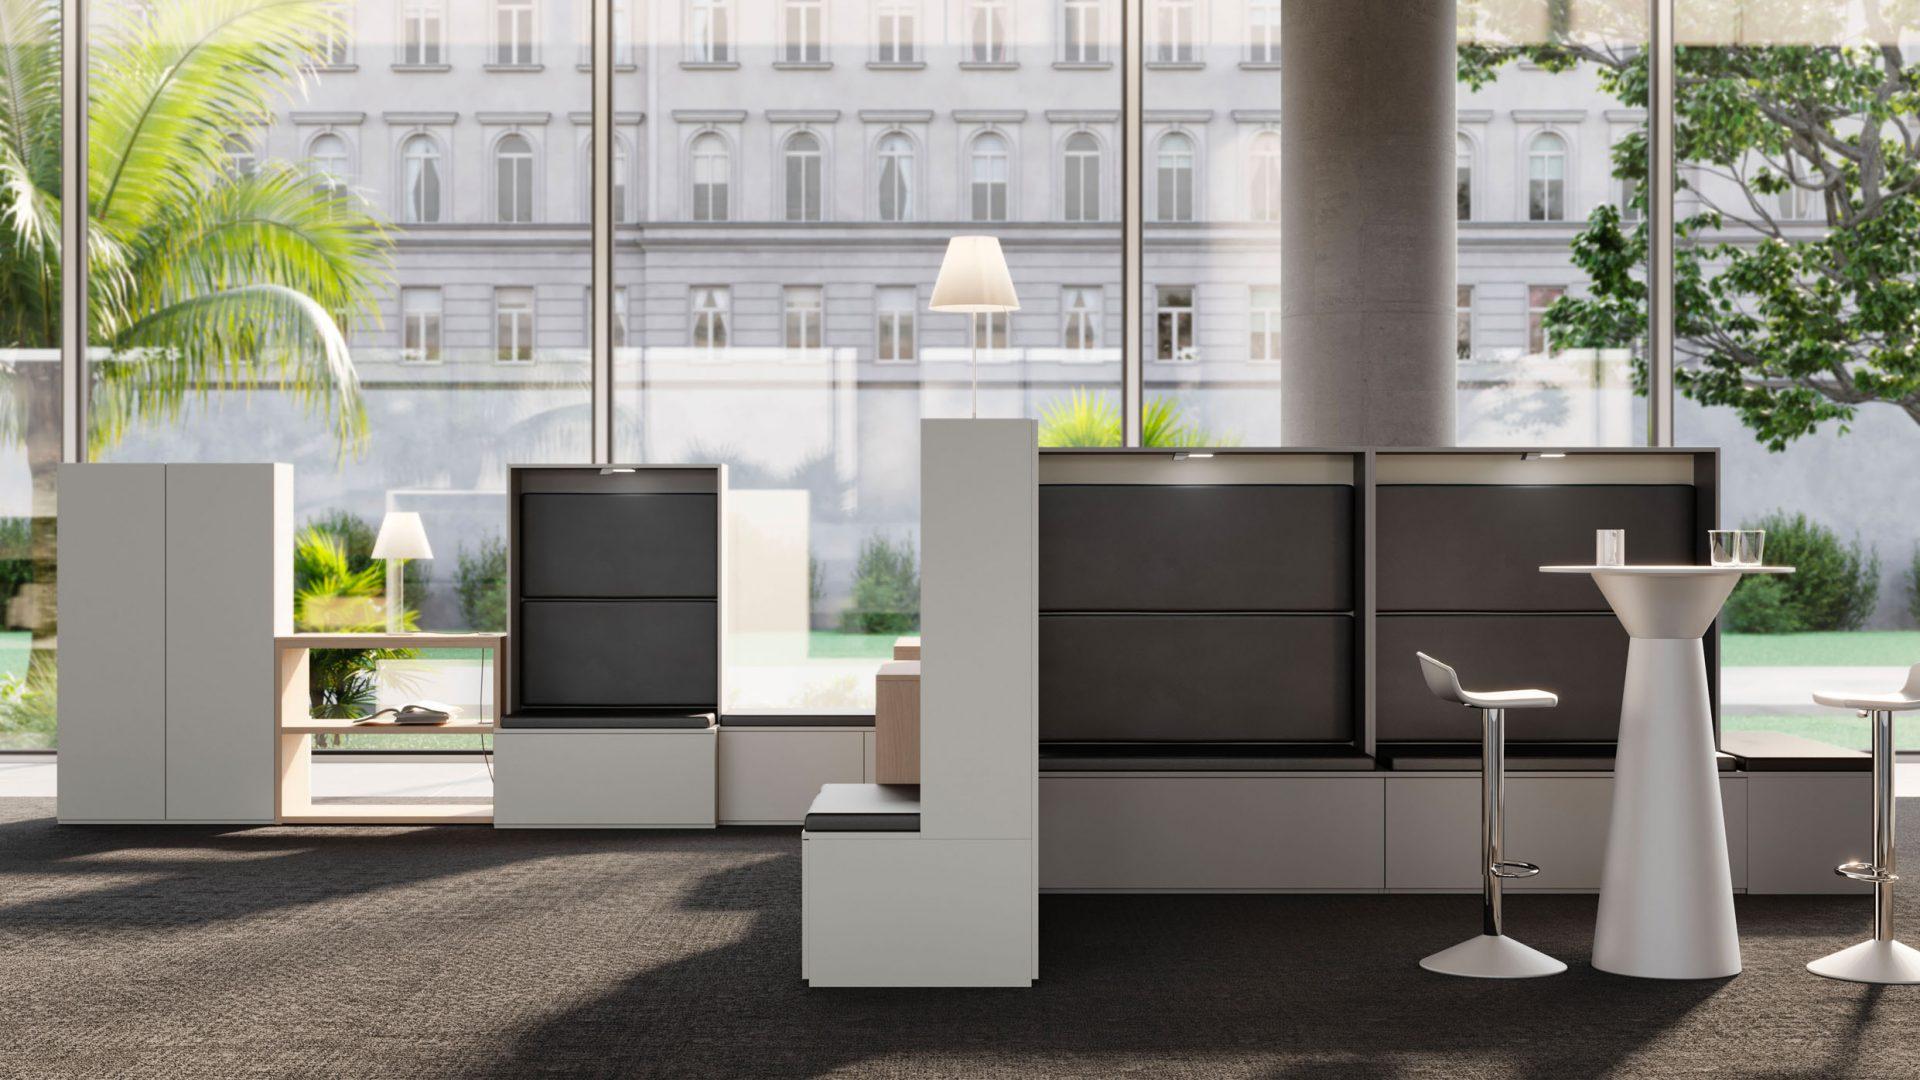 nardiinterni-community-aree-comuni-area-lounge-1920×1080